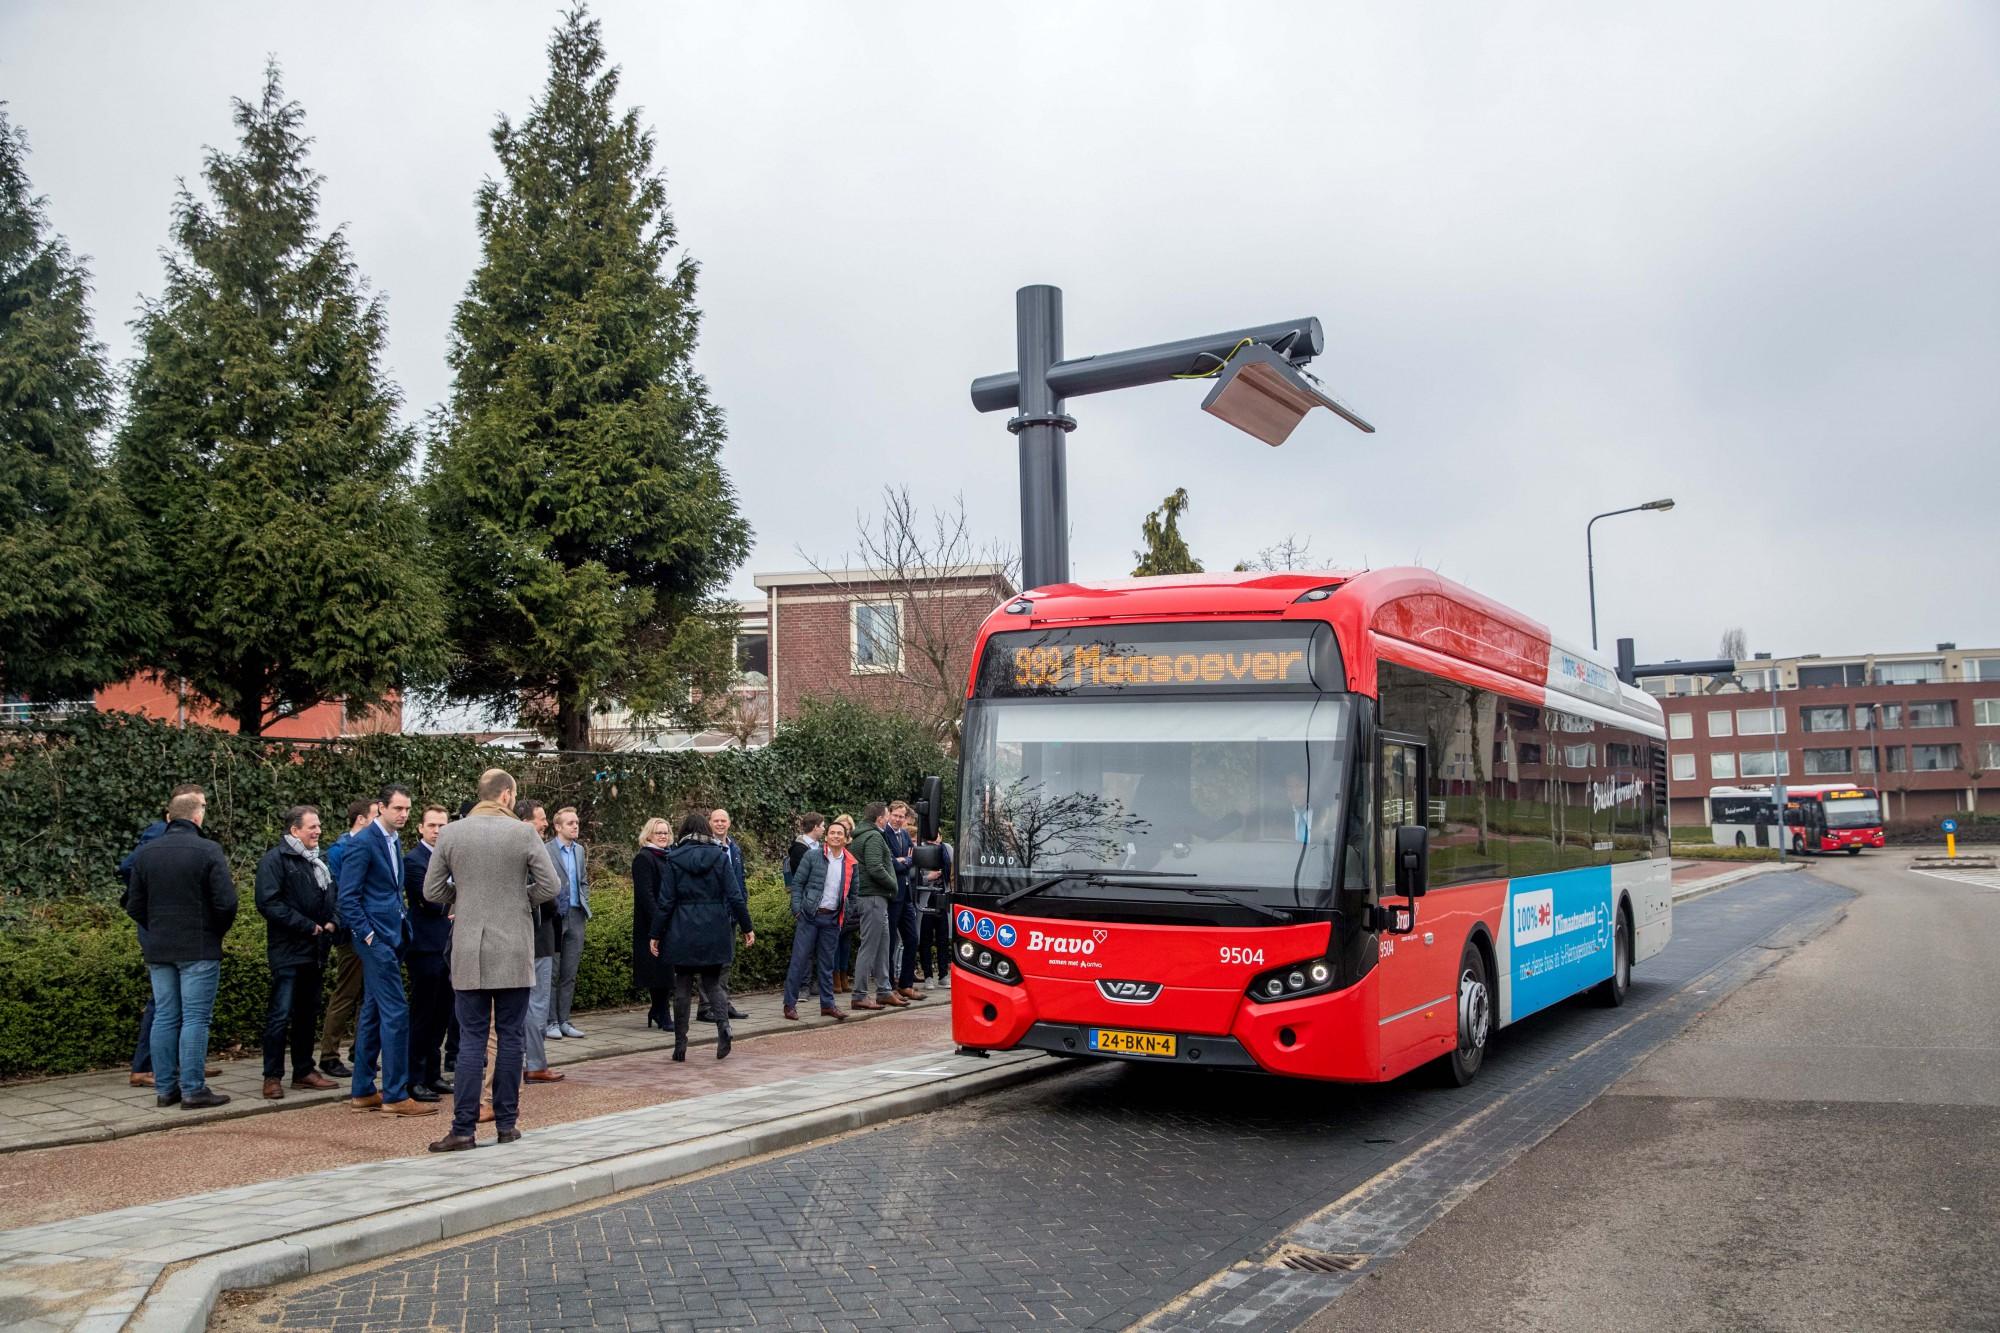 autobus elettrico vdl e-mobility